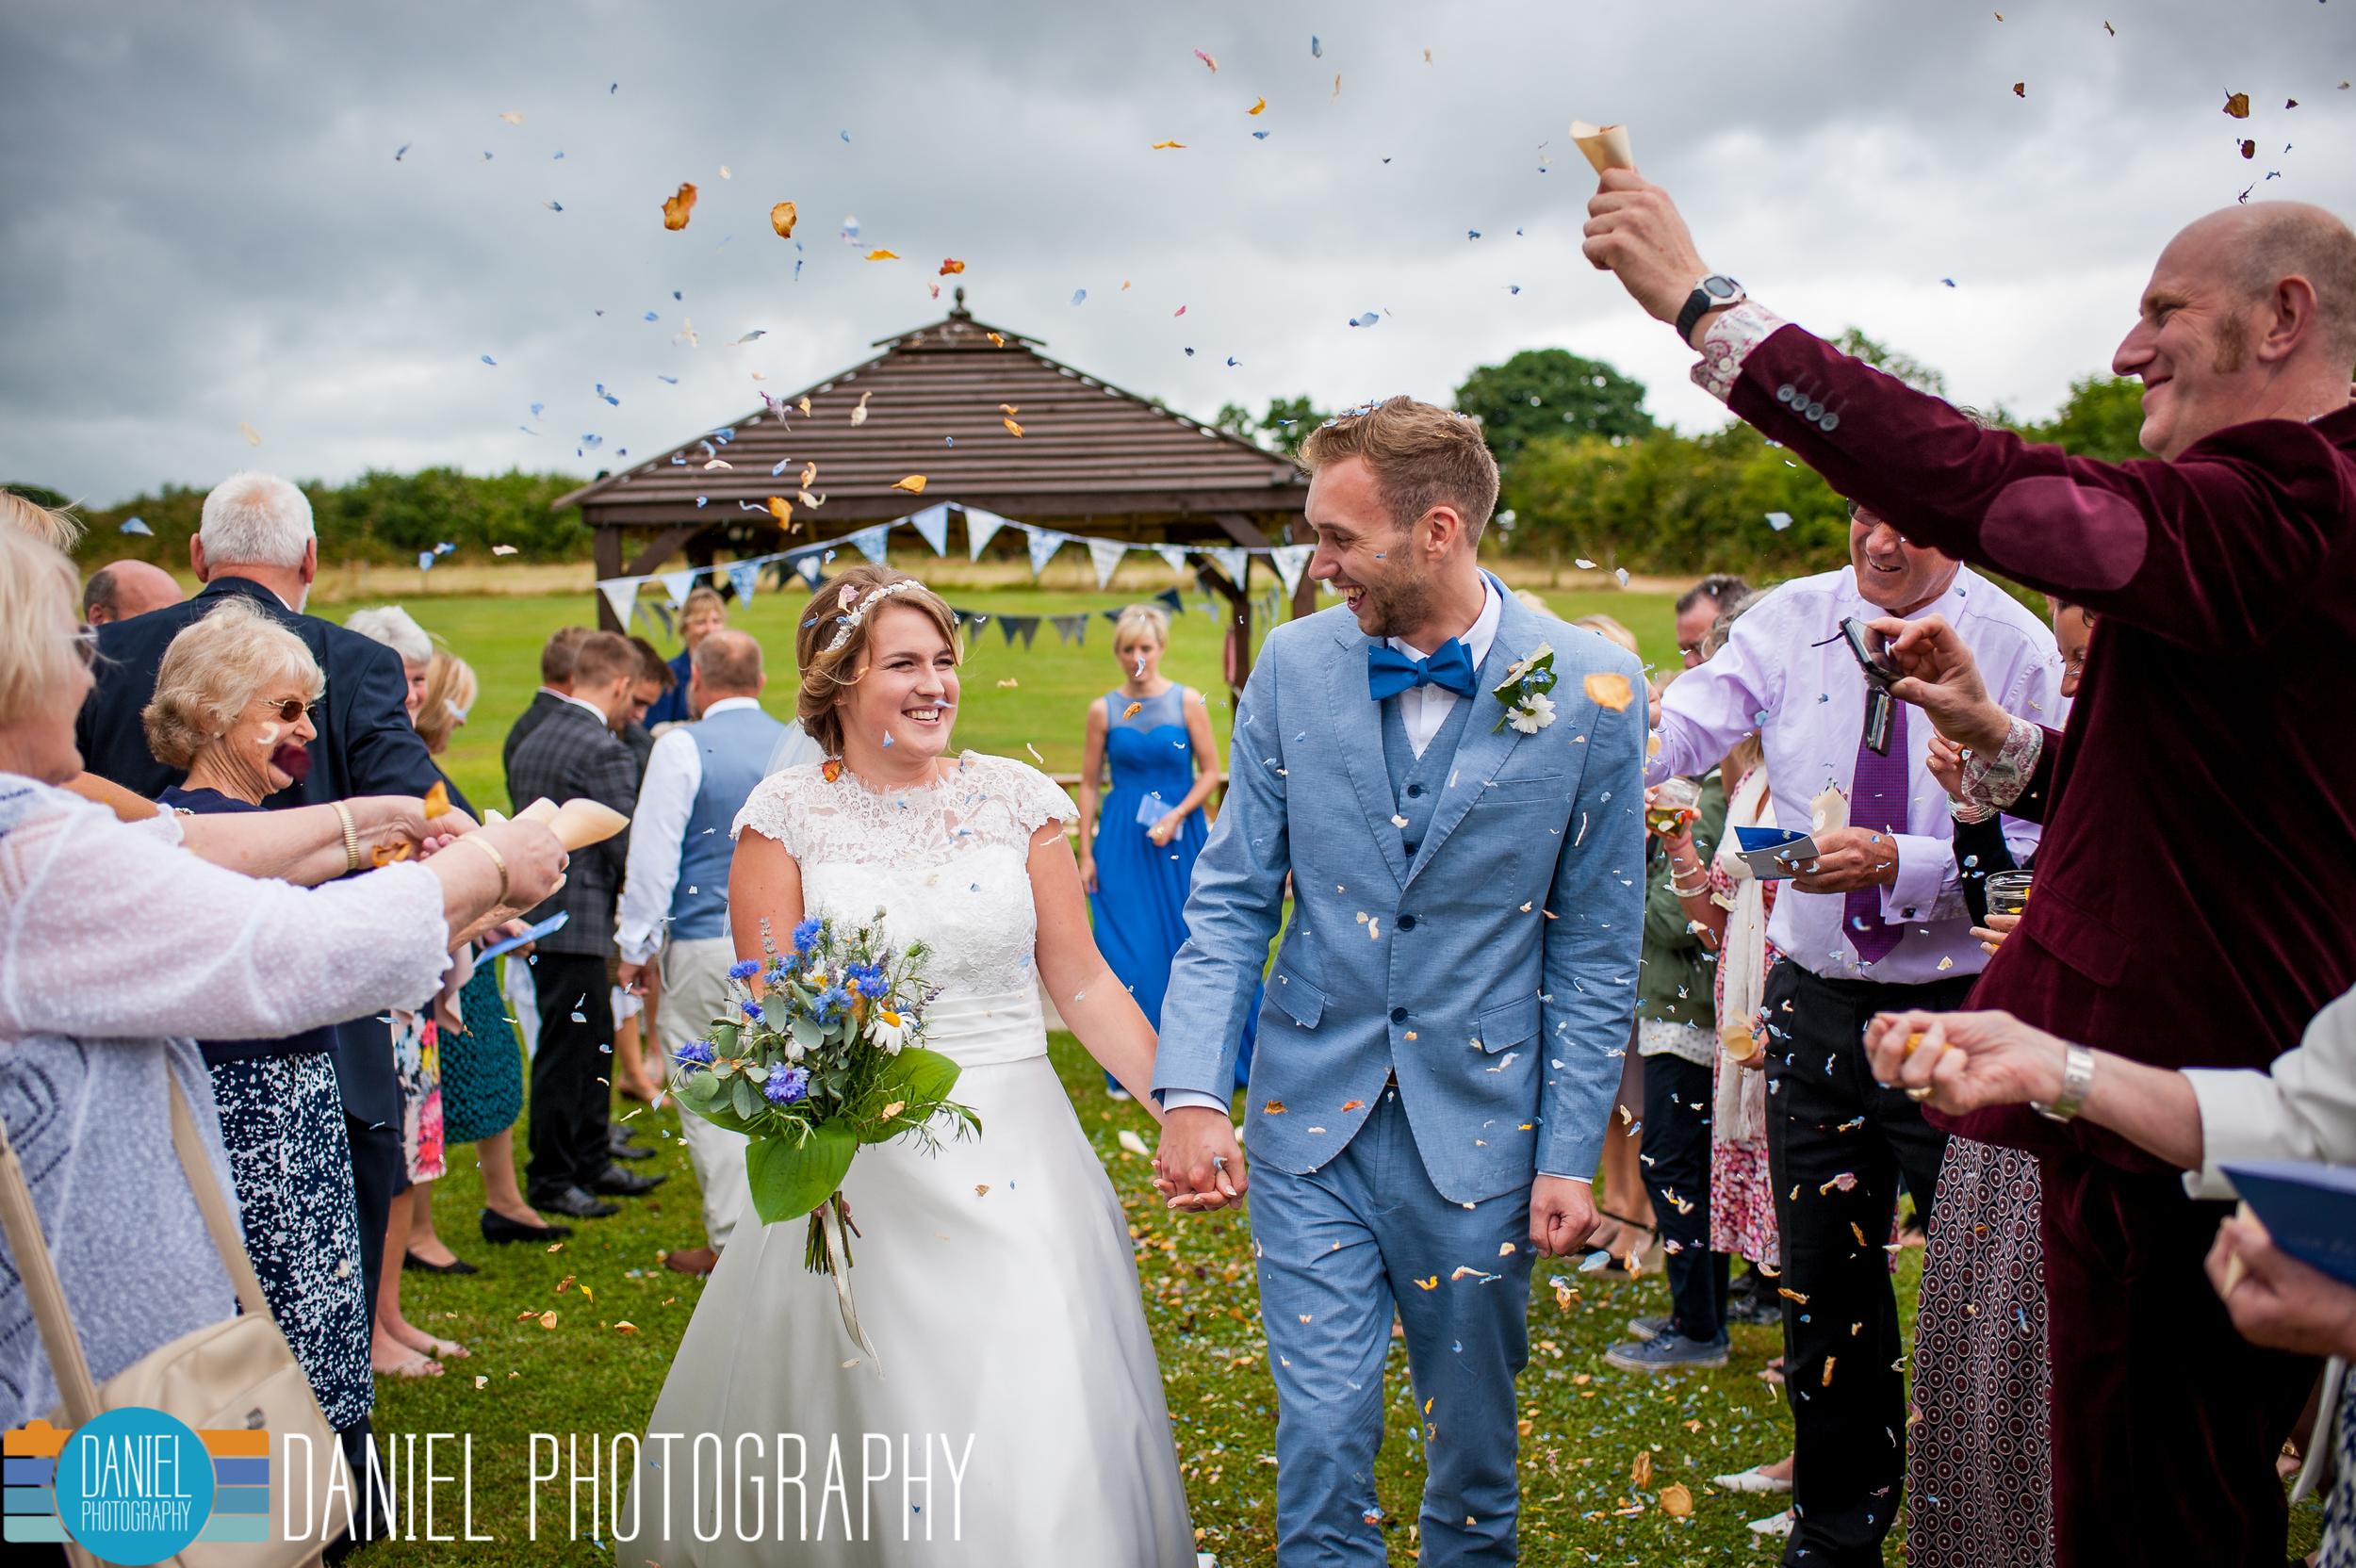 Dorset Wedding Photography, Knowlton Church - Daniel Photography, Hampshire Wedding Photographer